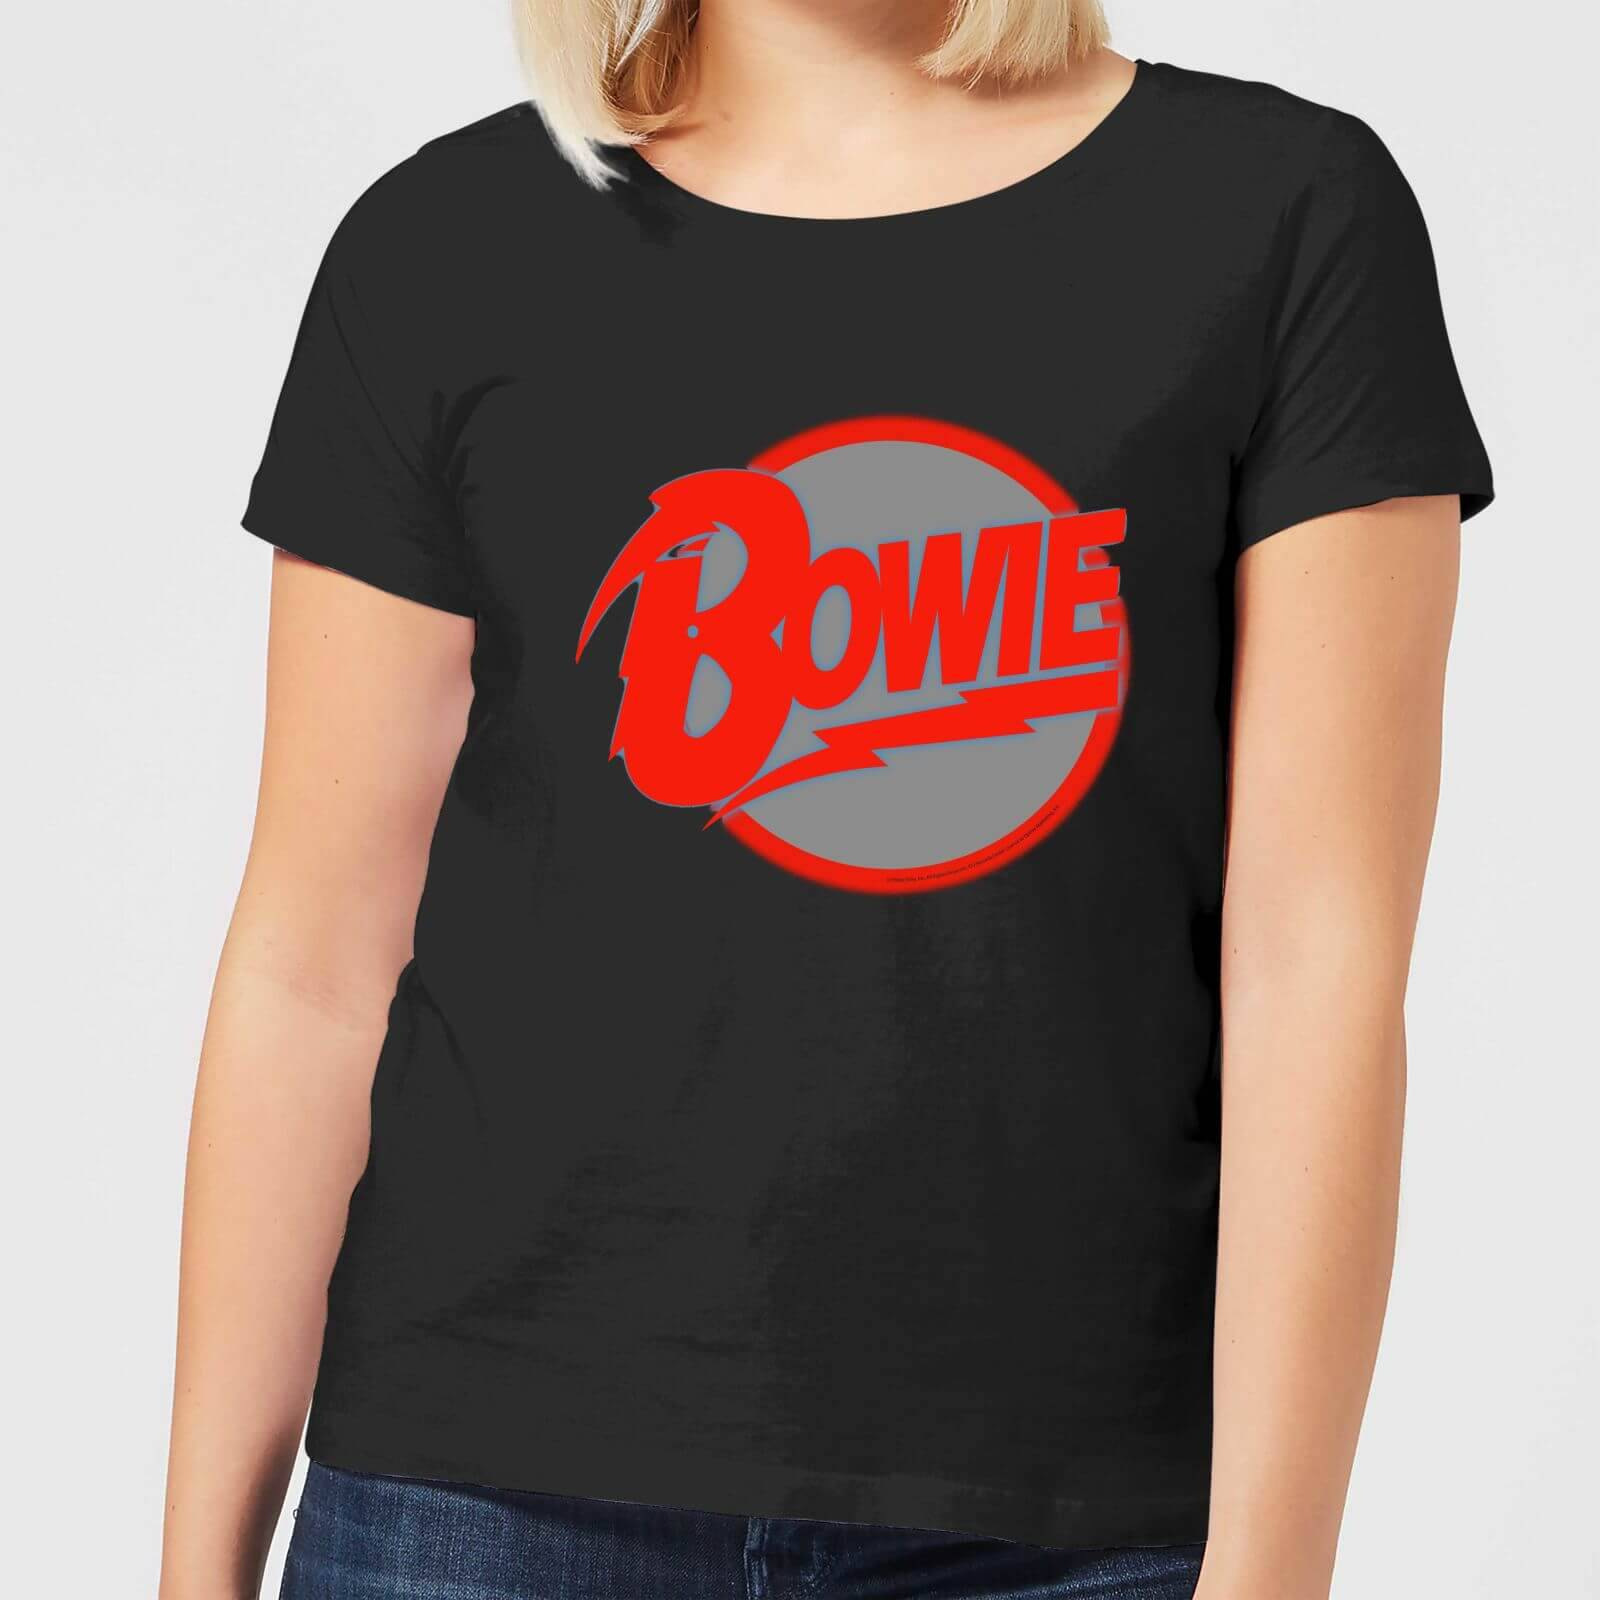 David Bowie Diamond Dogs Women's T-Shirt - Black - S - Black